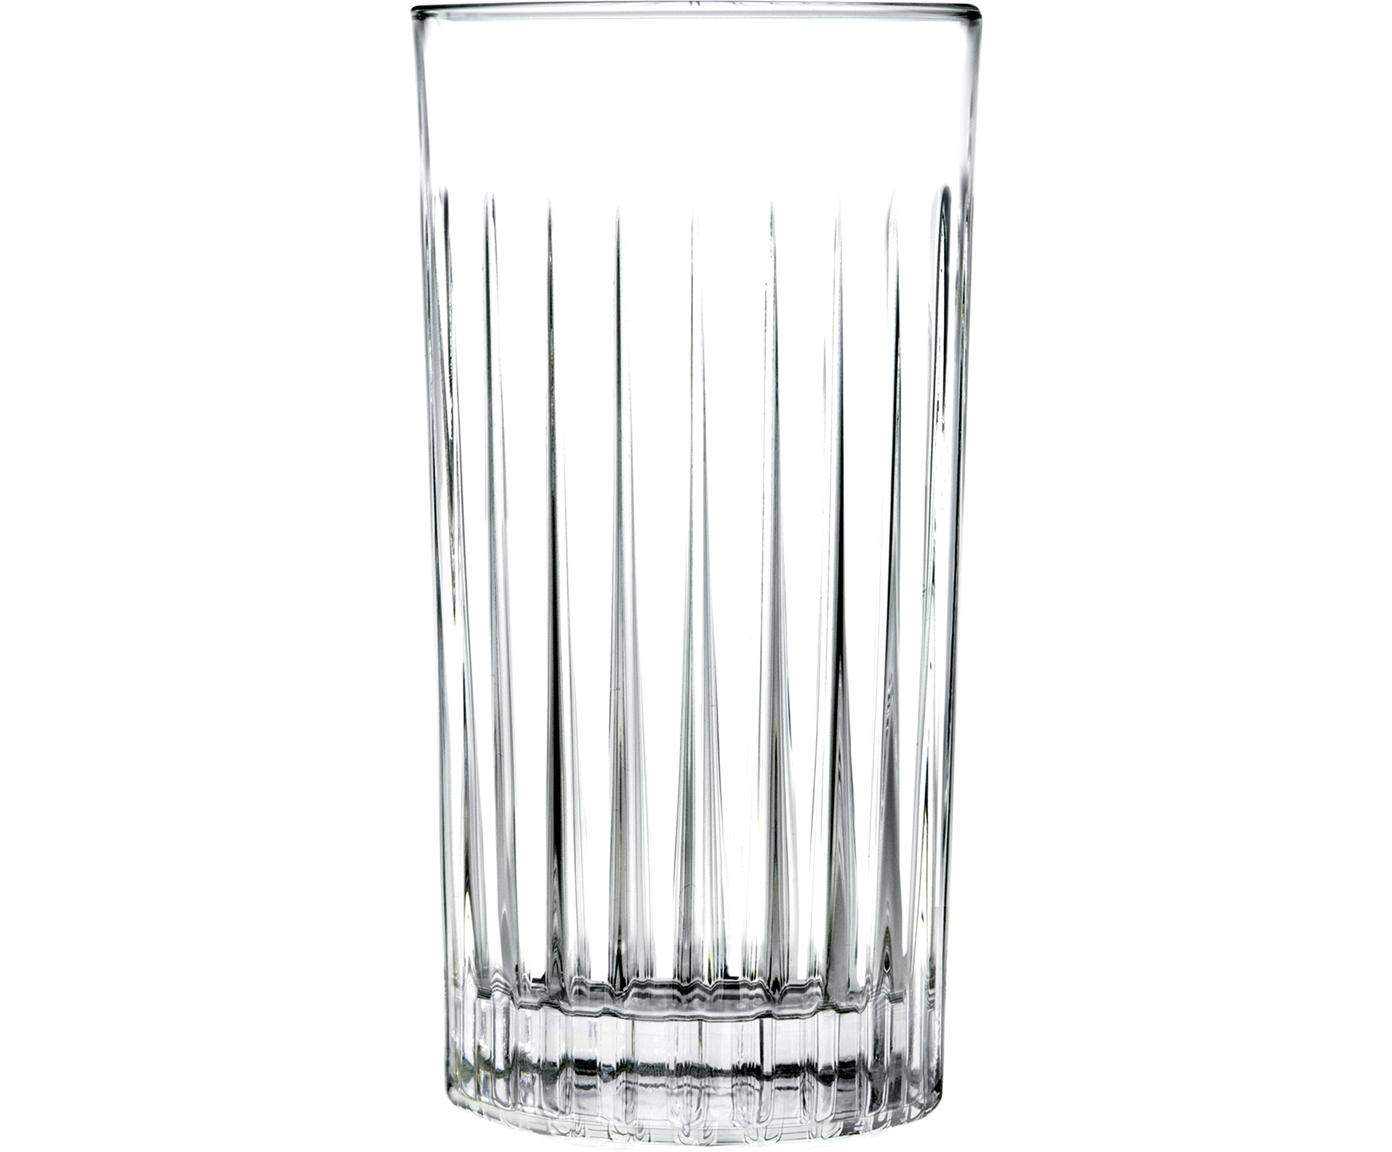 Kristallen longdrinkglazen Timeless, 6 stuks, Kristalglas, Transparant, Ø 8 x H 15 cm